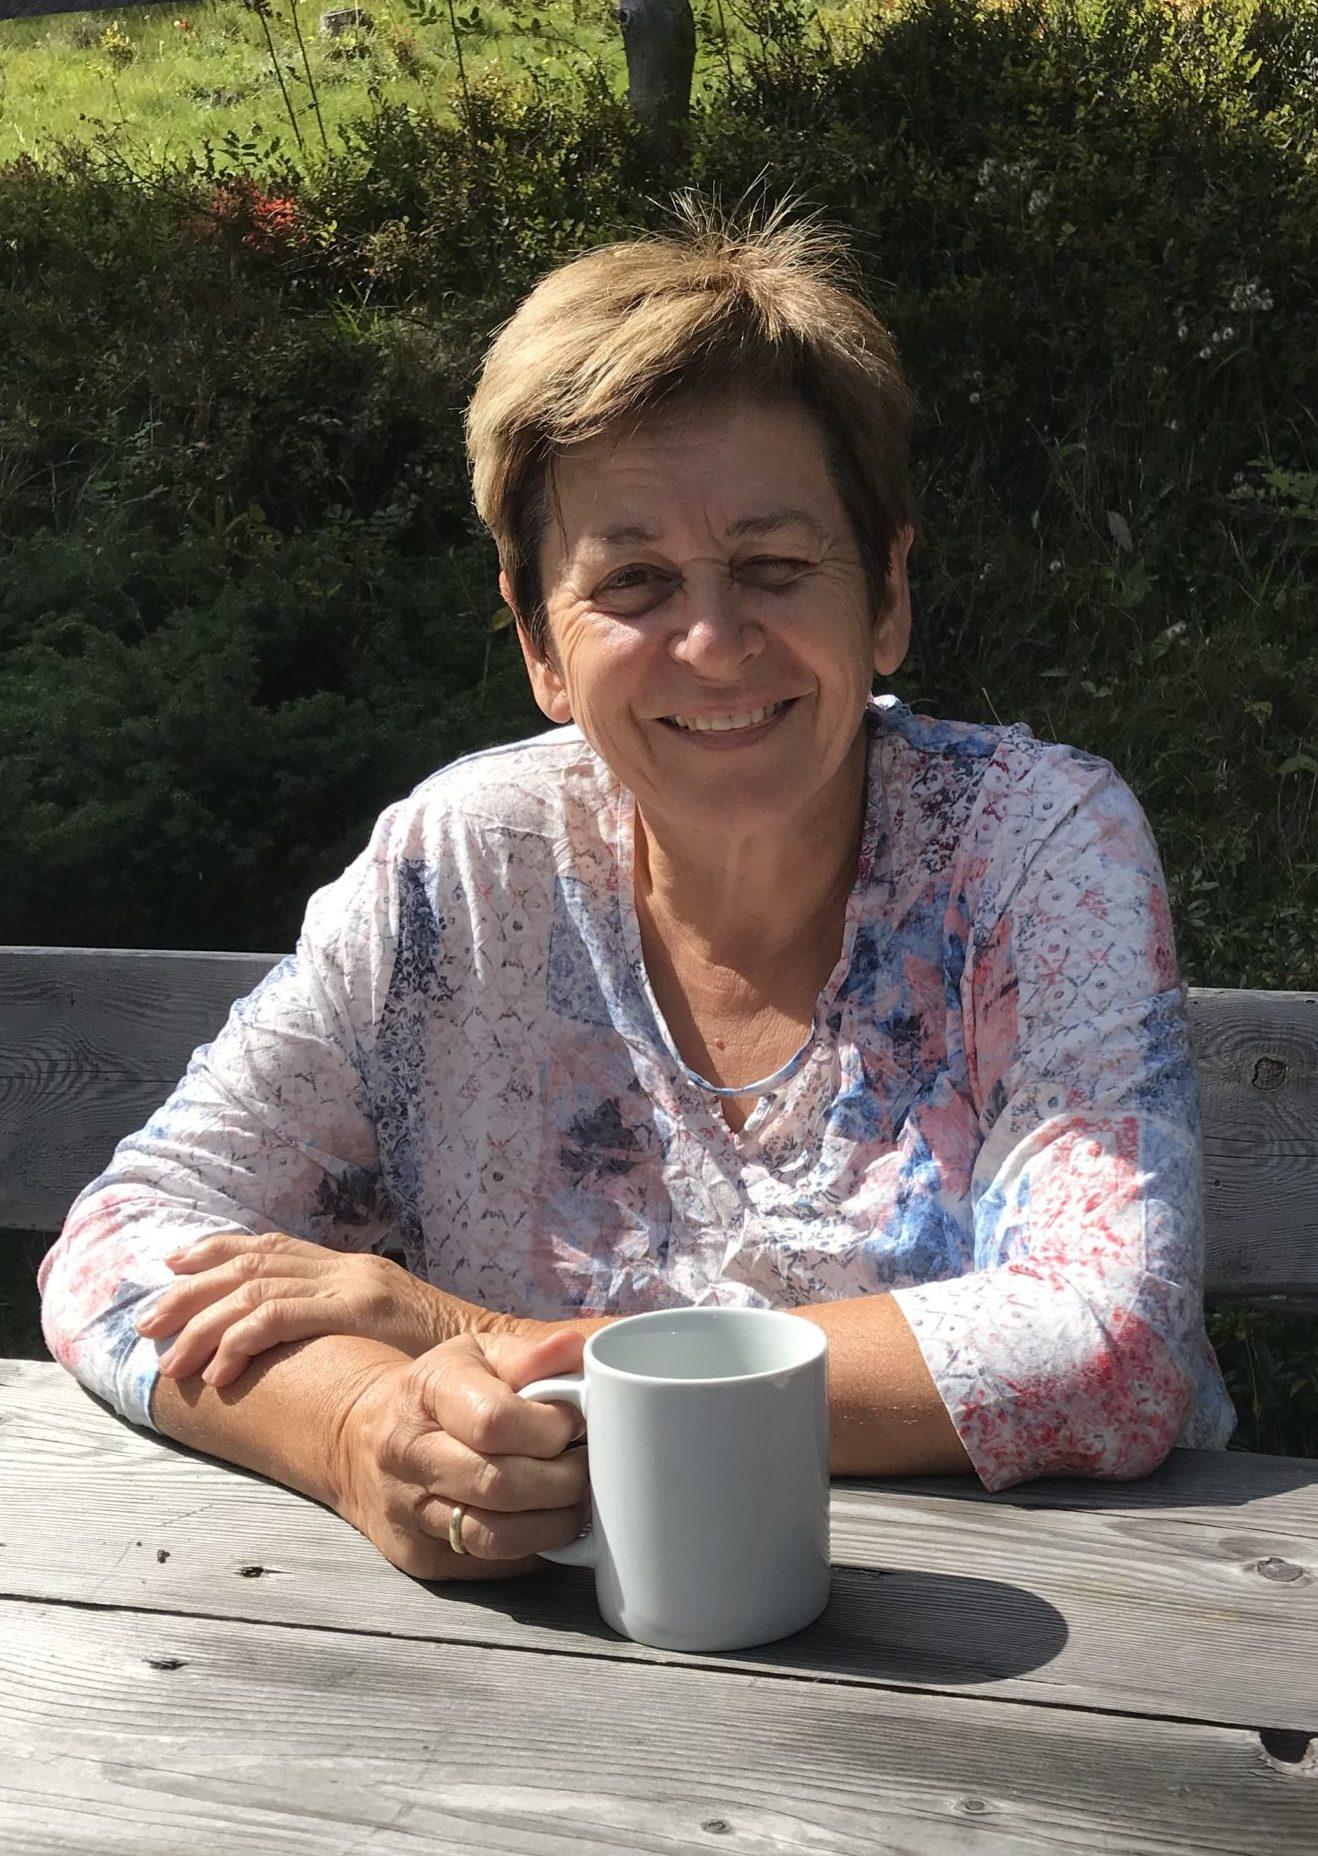 Heidemarie Orawski